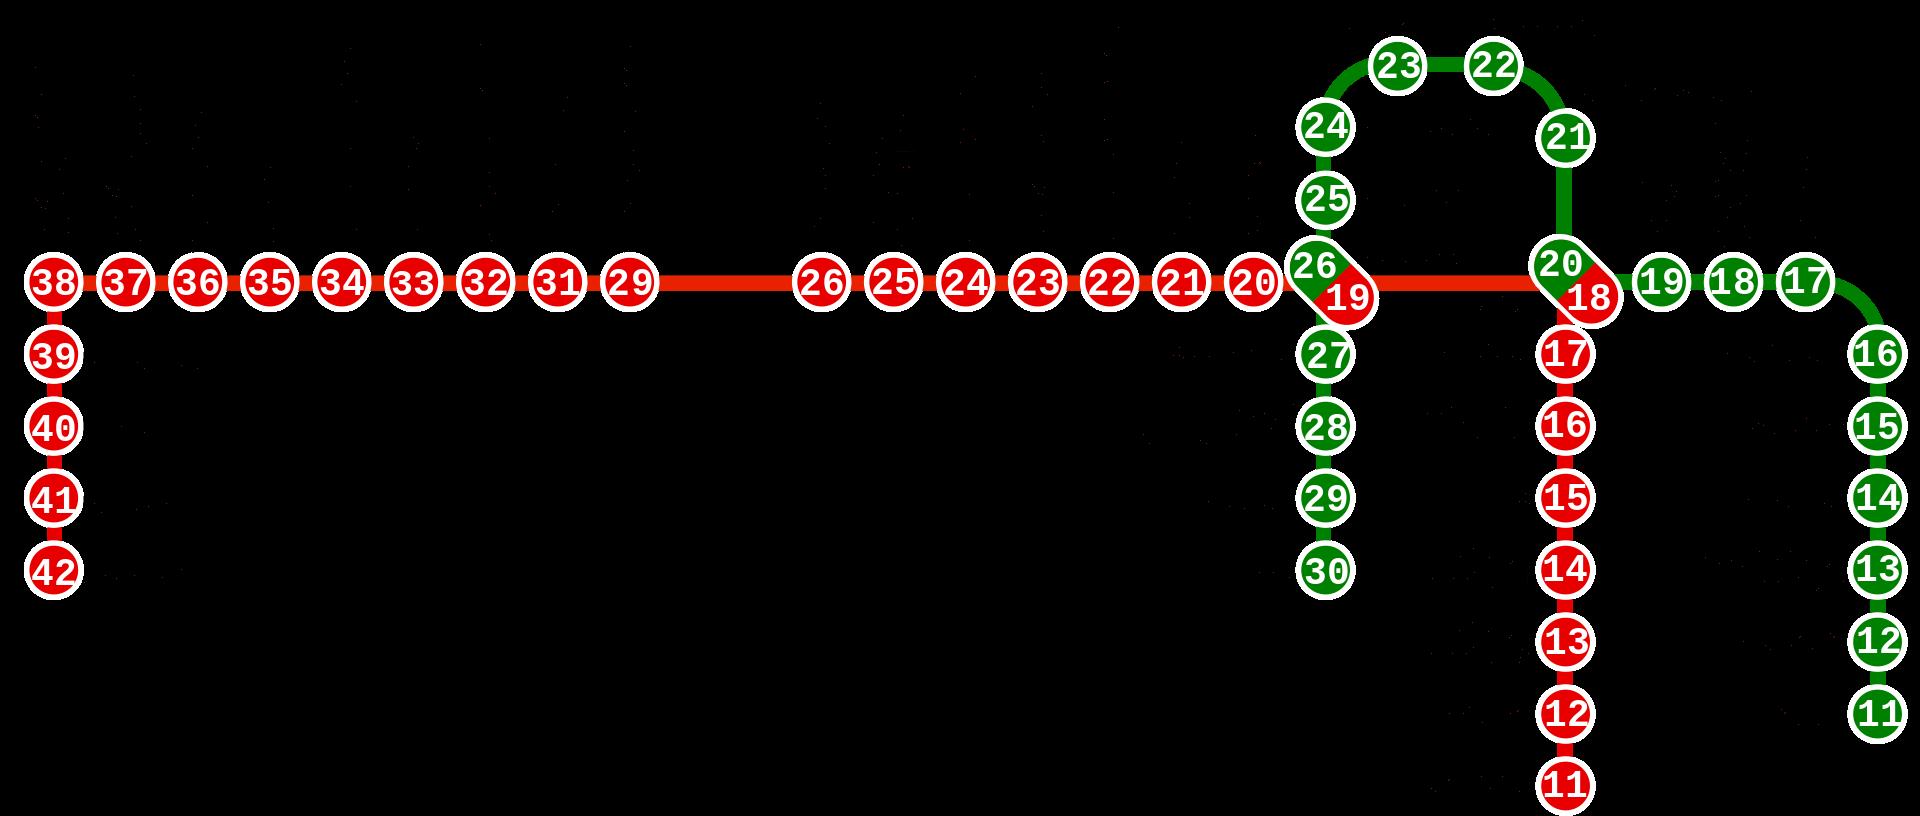 Метро Дубая (схема)